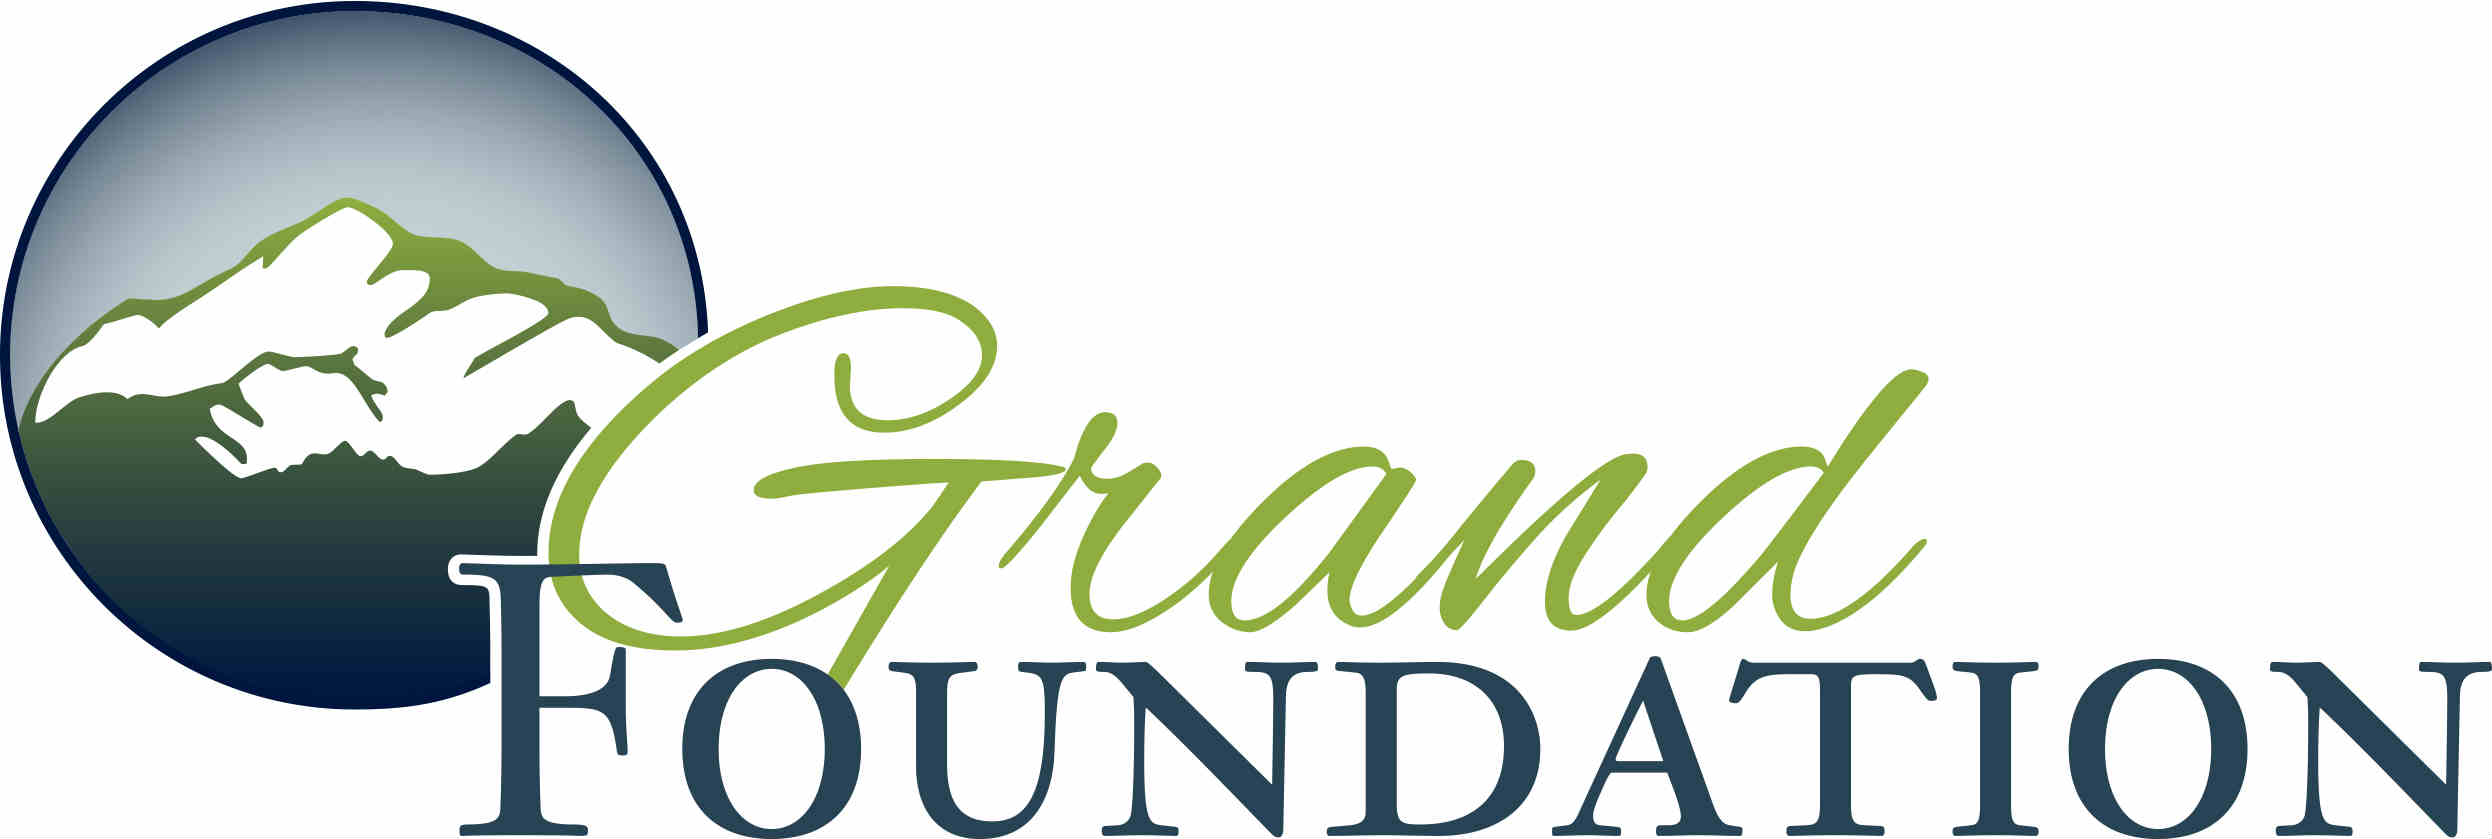 Grand Foundation Grants Database